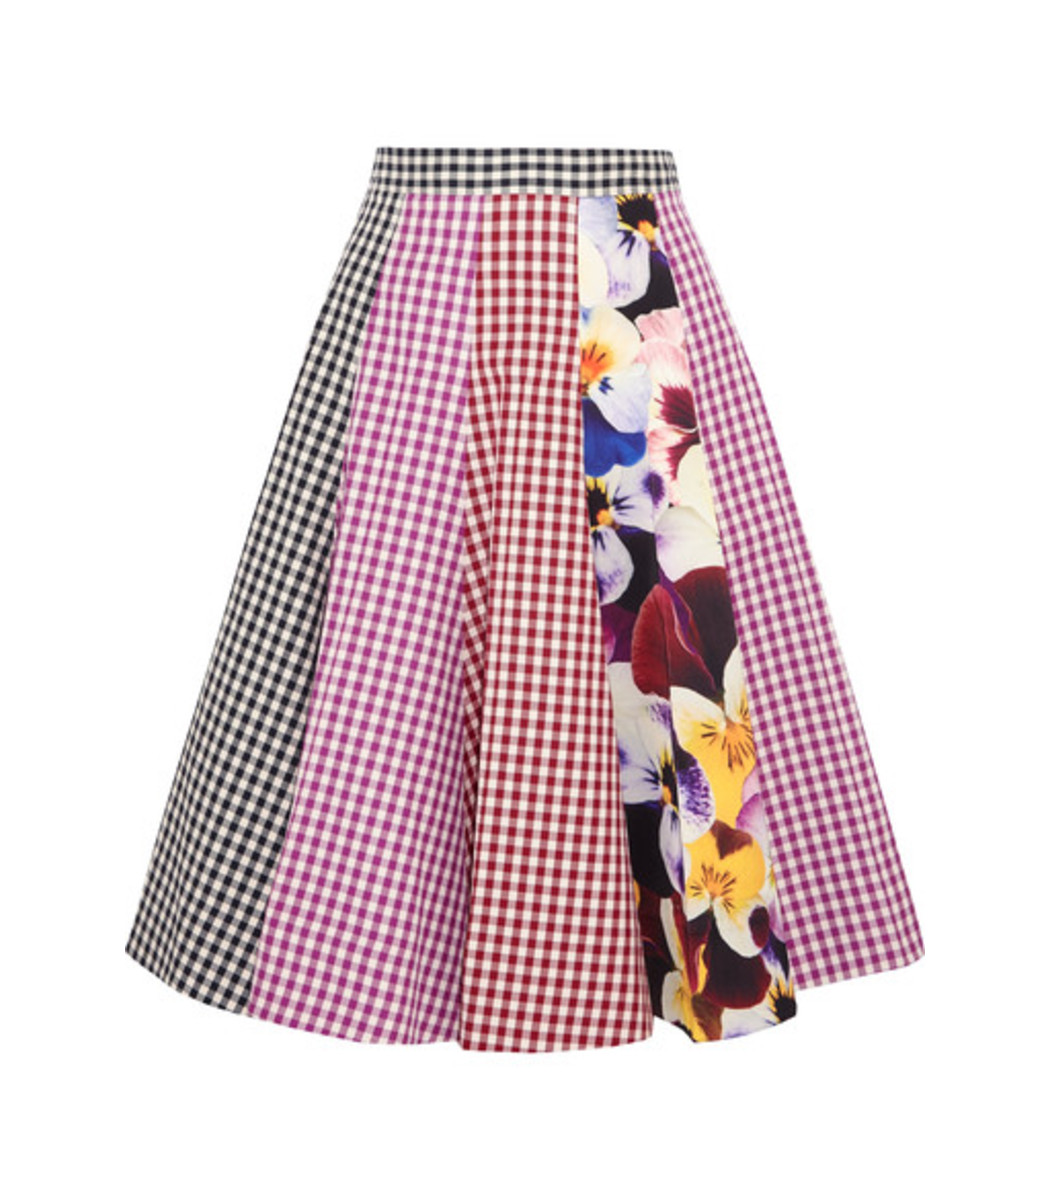 Christopher Kane Gingham Printed A-line Skirt - Gingham Printed A ...